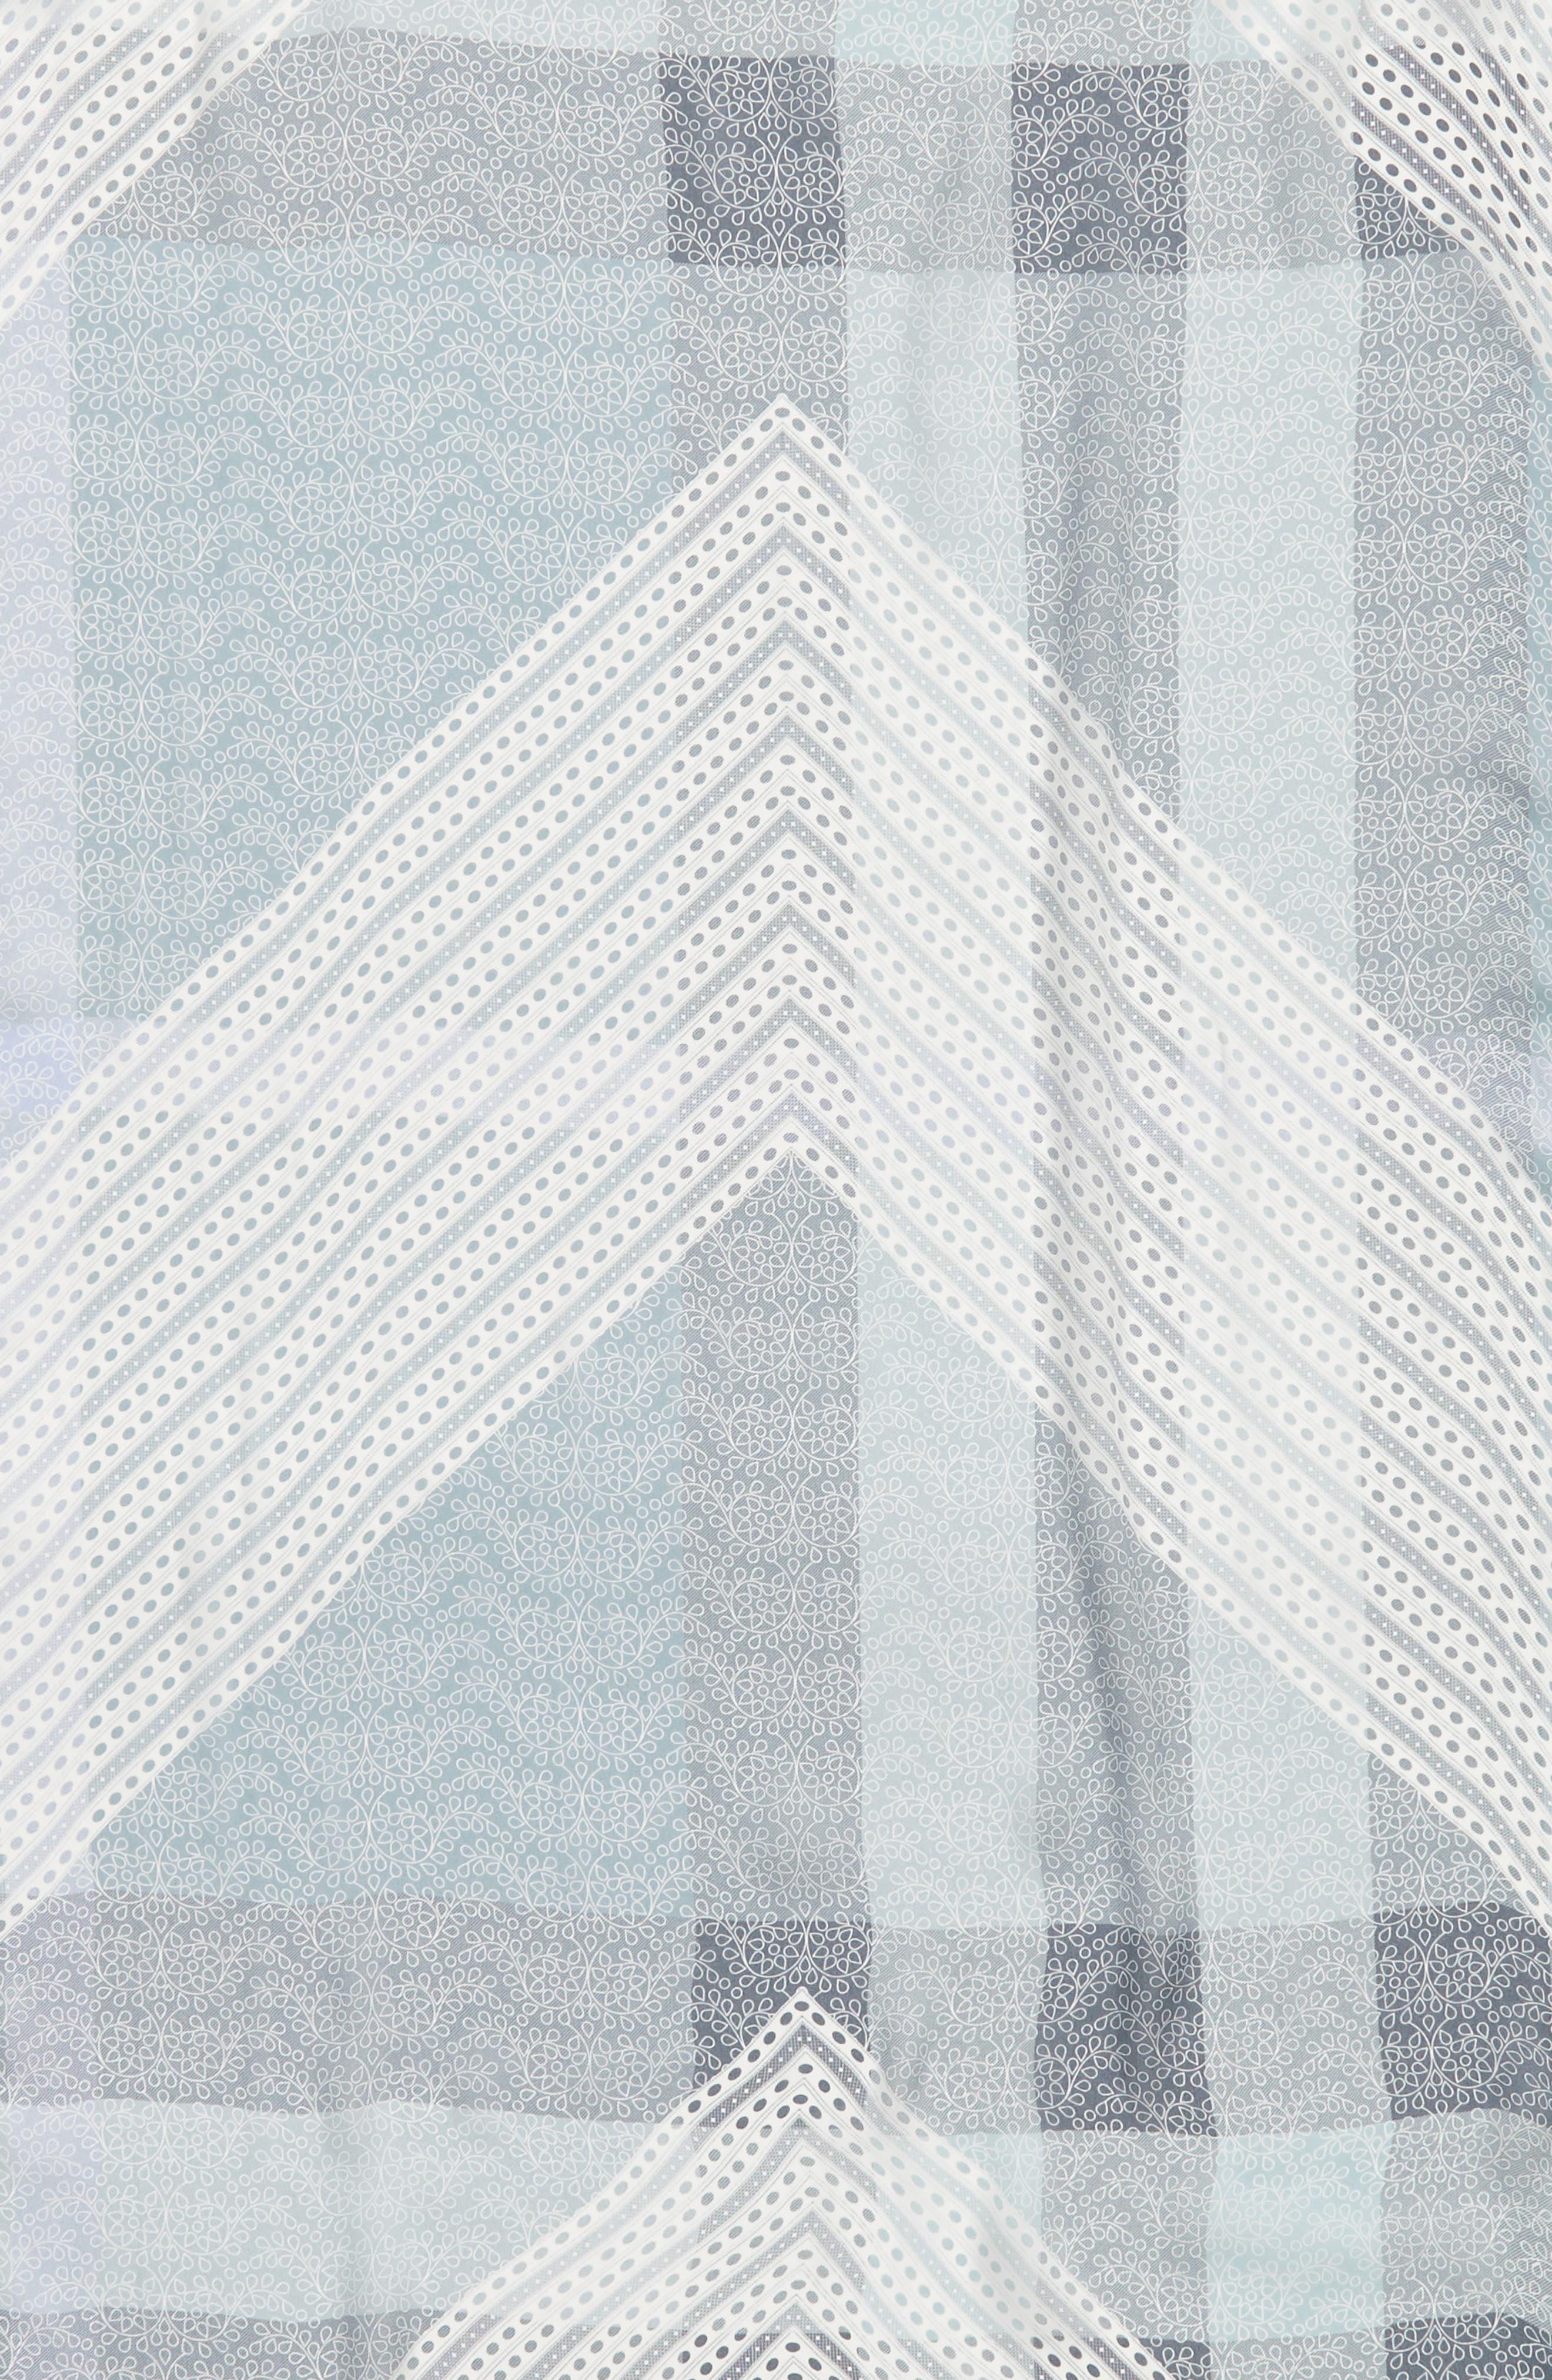 Ultra Mega Lace Silk Scarf,                             Alternate thumbnail 4, color,                             Slate Blue